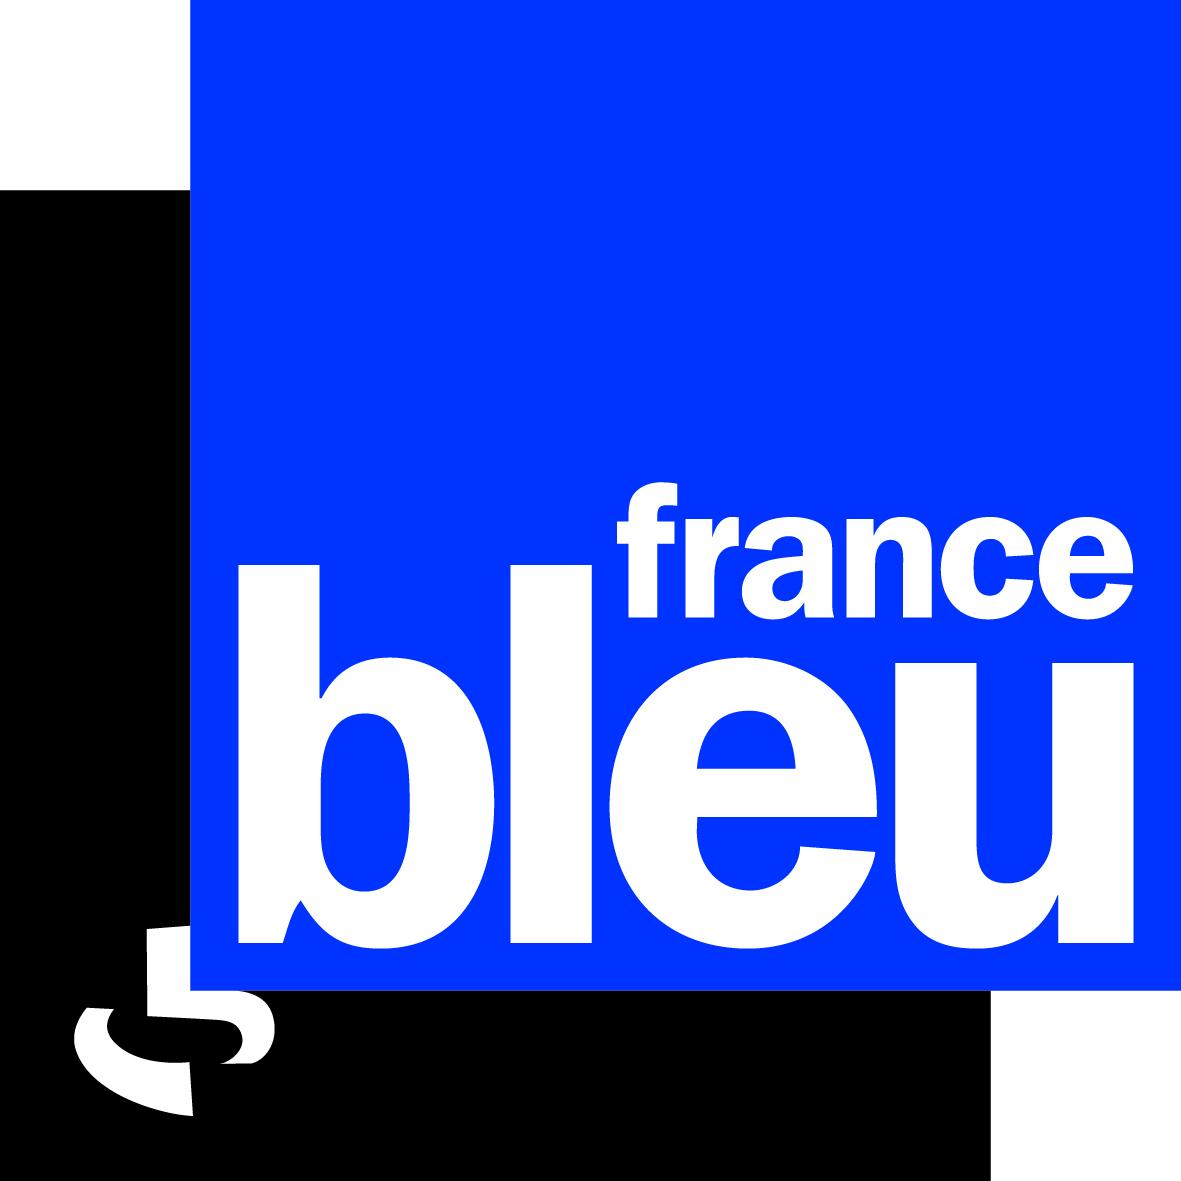 LOGO-FRANCE-BLEU.jpg